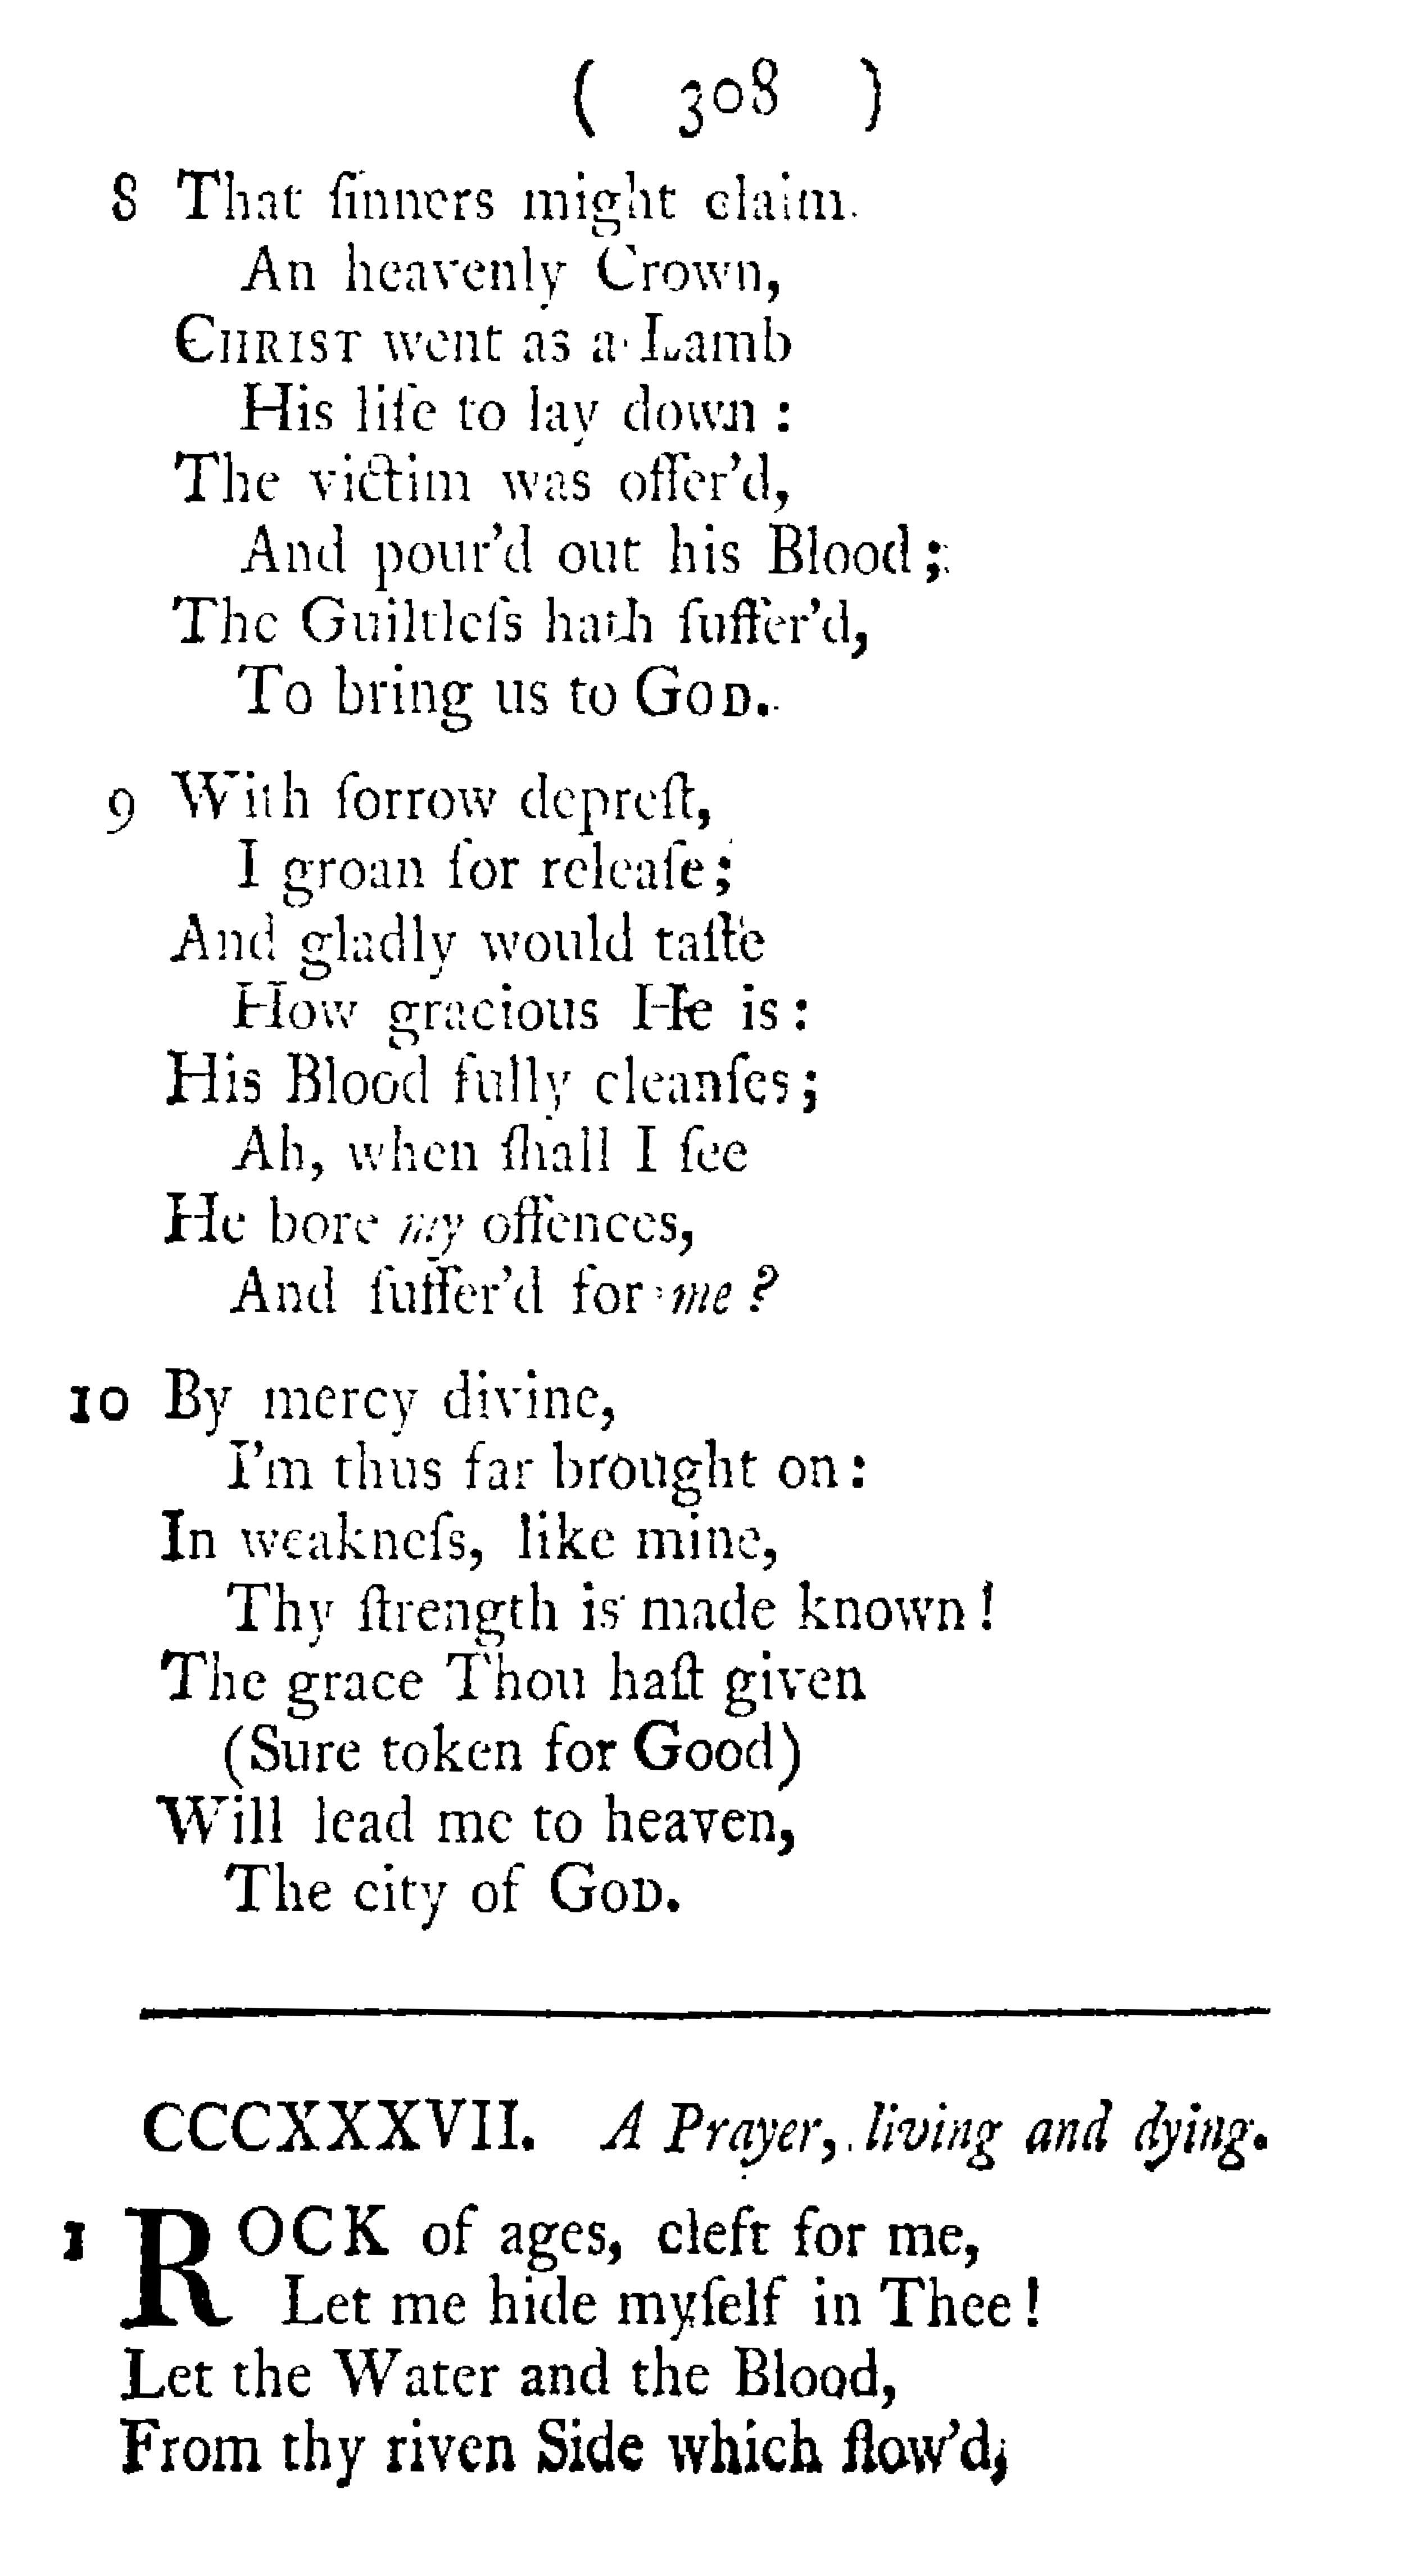 PsalmsandHymns-1776_ECCO-312.jpg